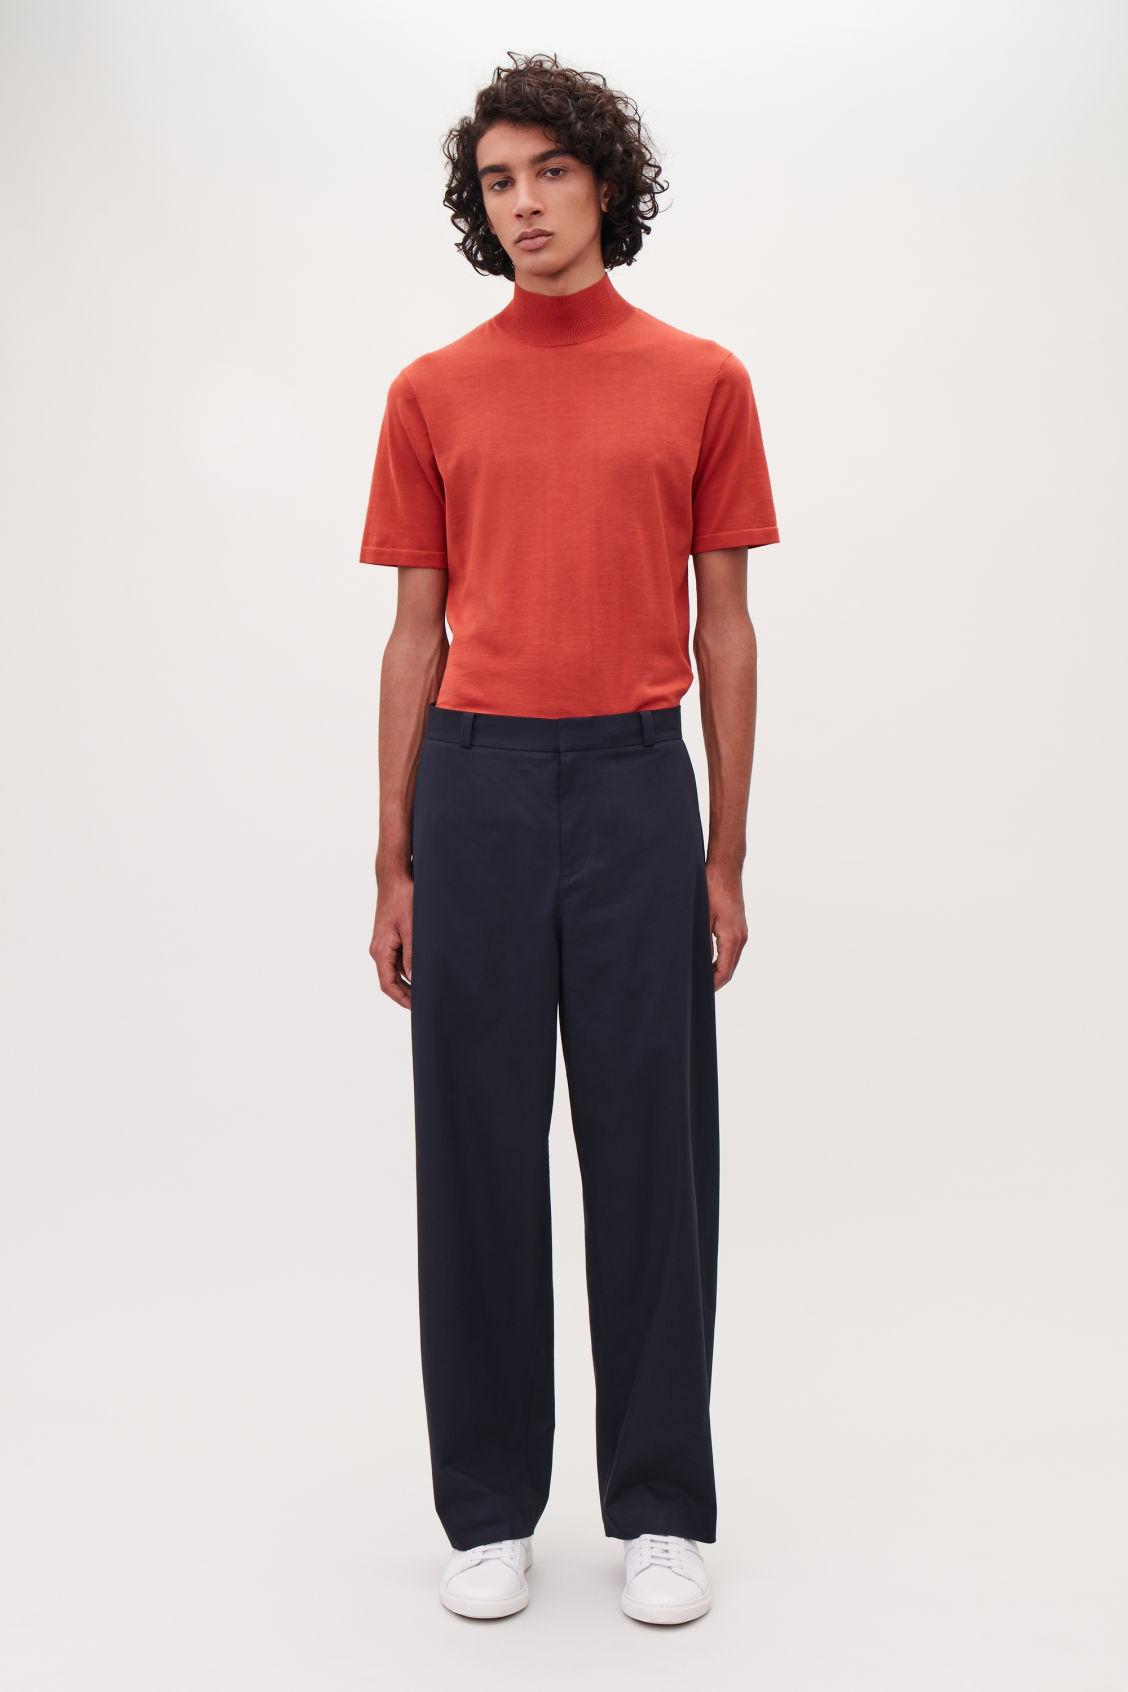 Closed Wide leg trousers NaZjuyN